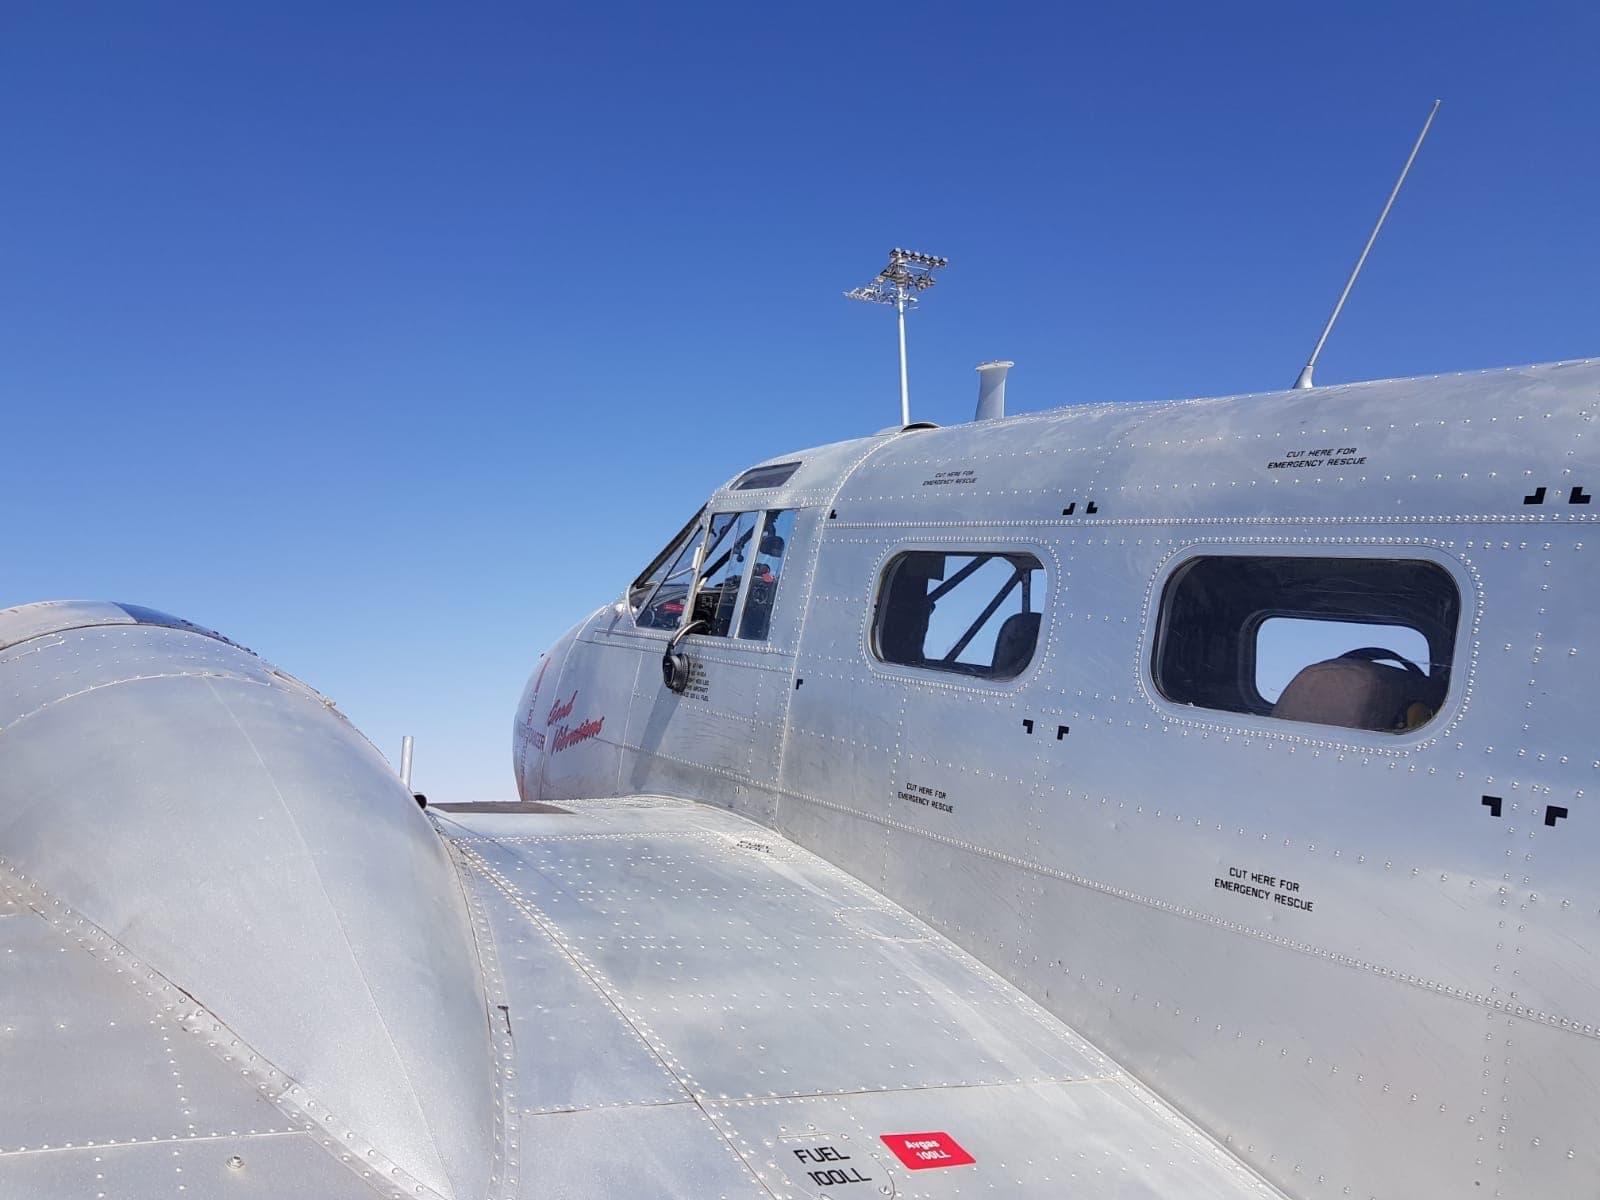 Mit dem Vintage-Flugzeug nach Al-Ula